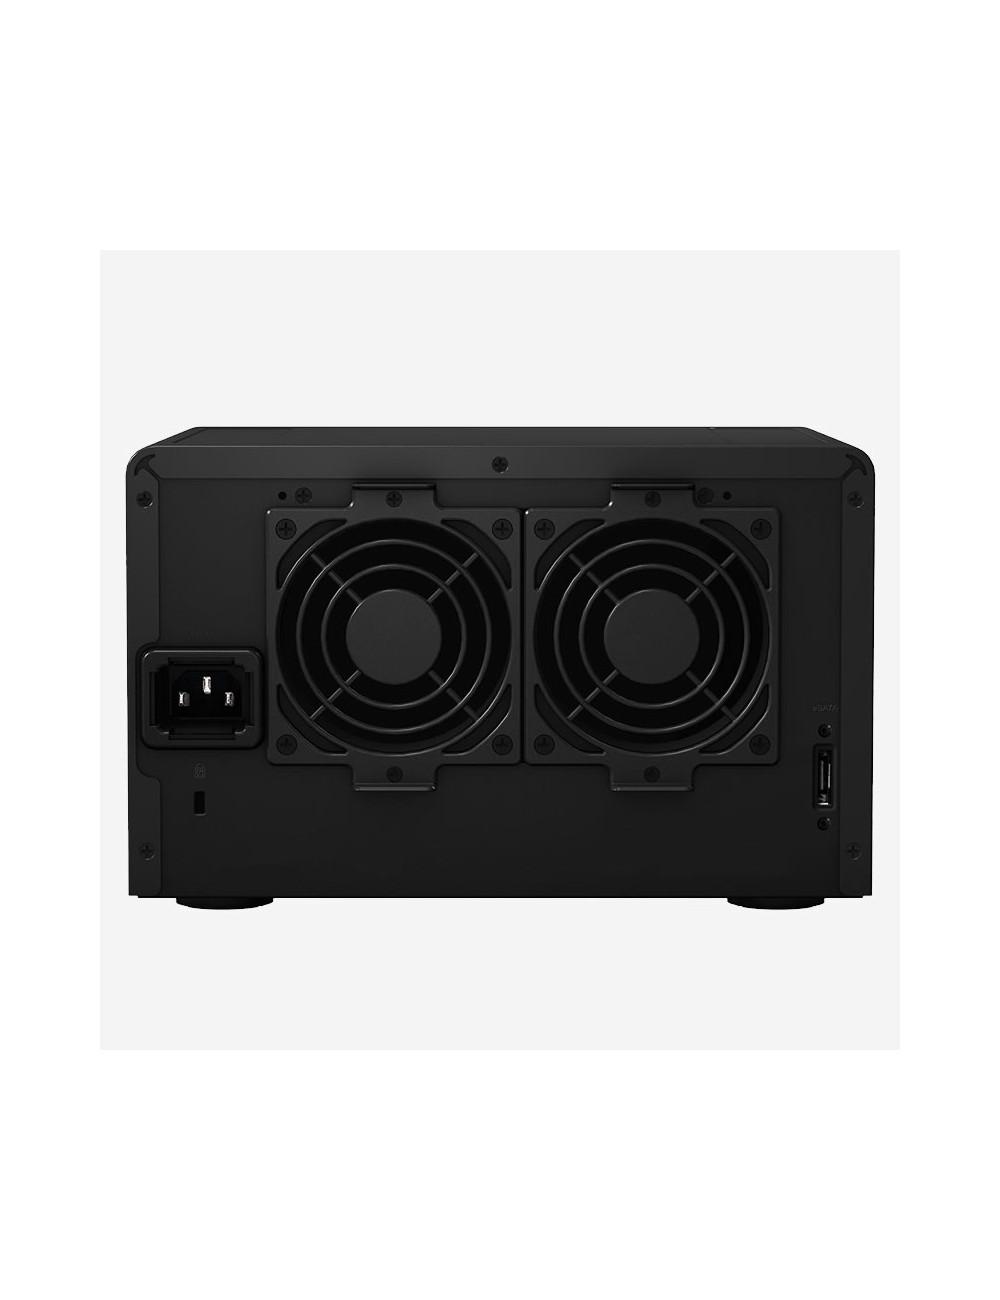 Synology RS217 NAS Server WD BLUE 8TB (2x4TB)